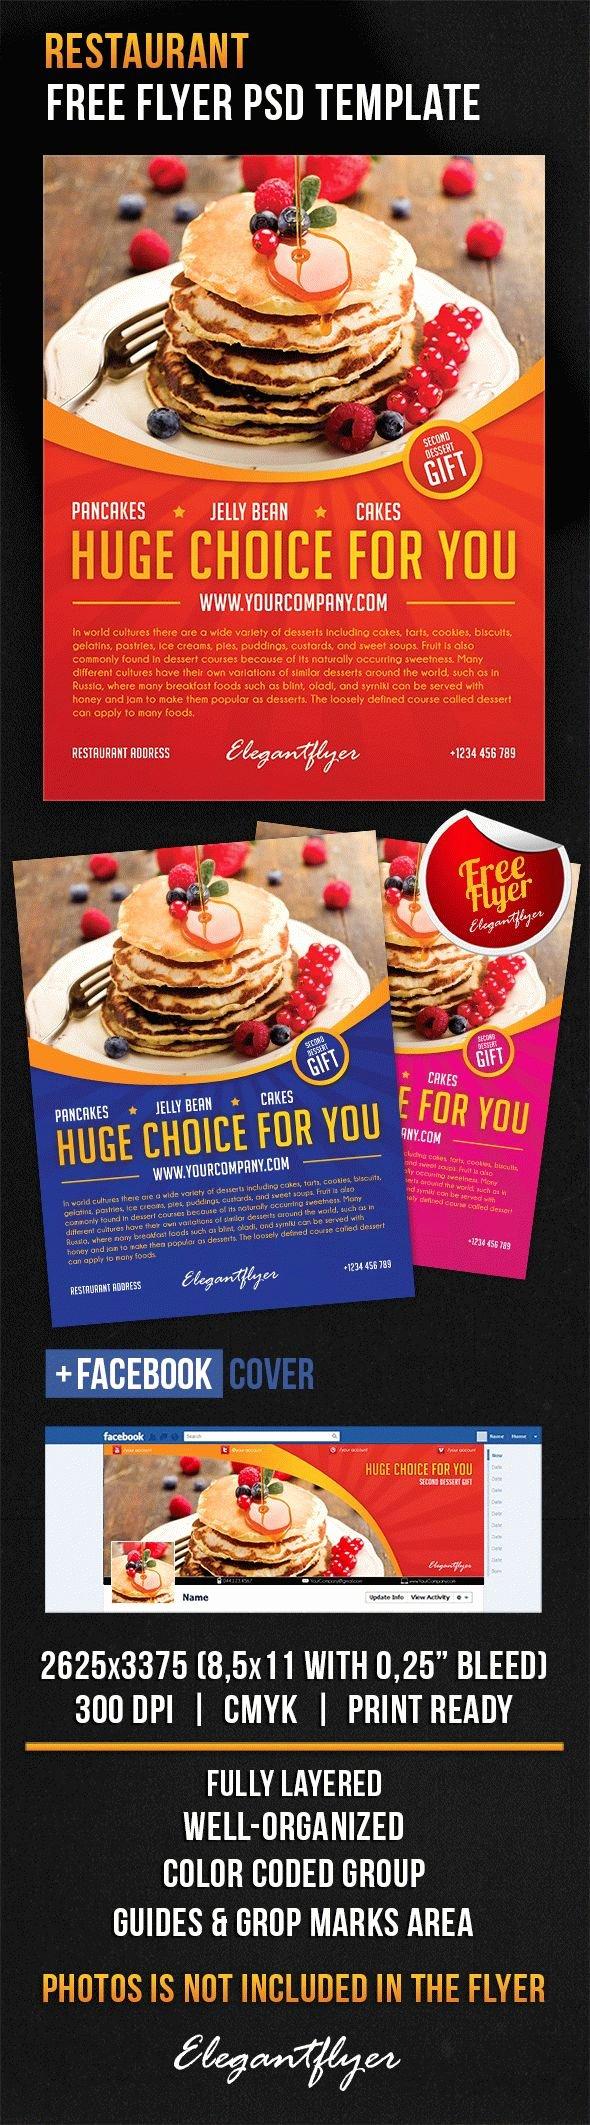 Restaurant Flyer Templates Free New Restaurant – Free Flyer Psd Template – by Elegantflyer